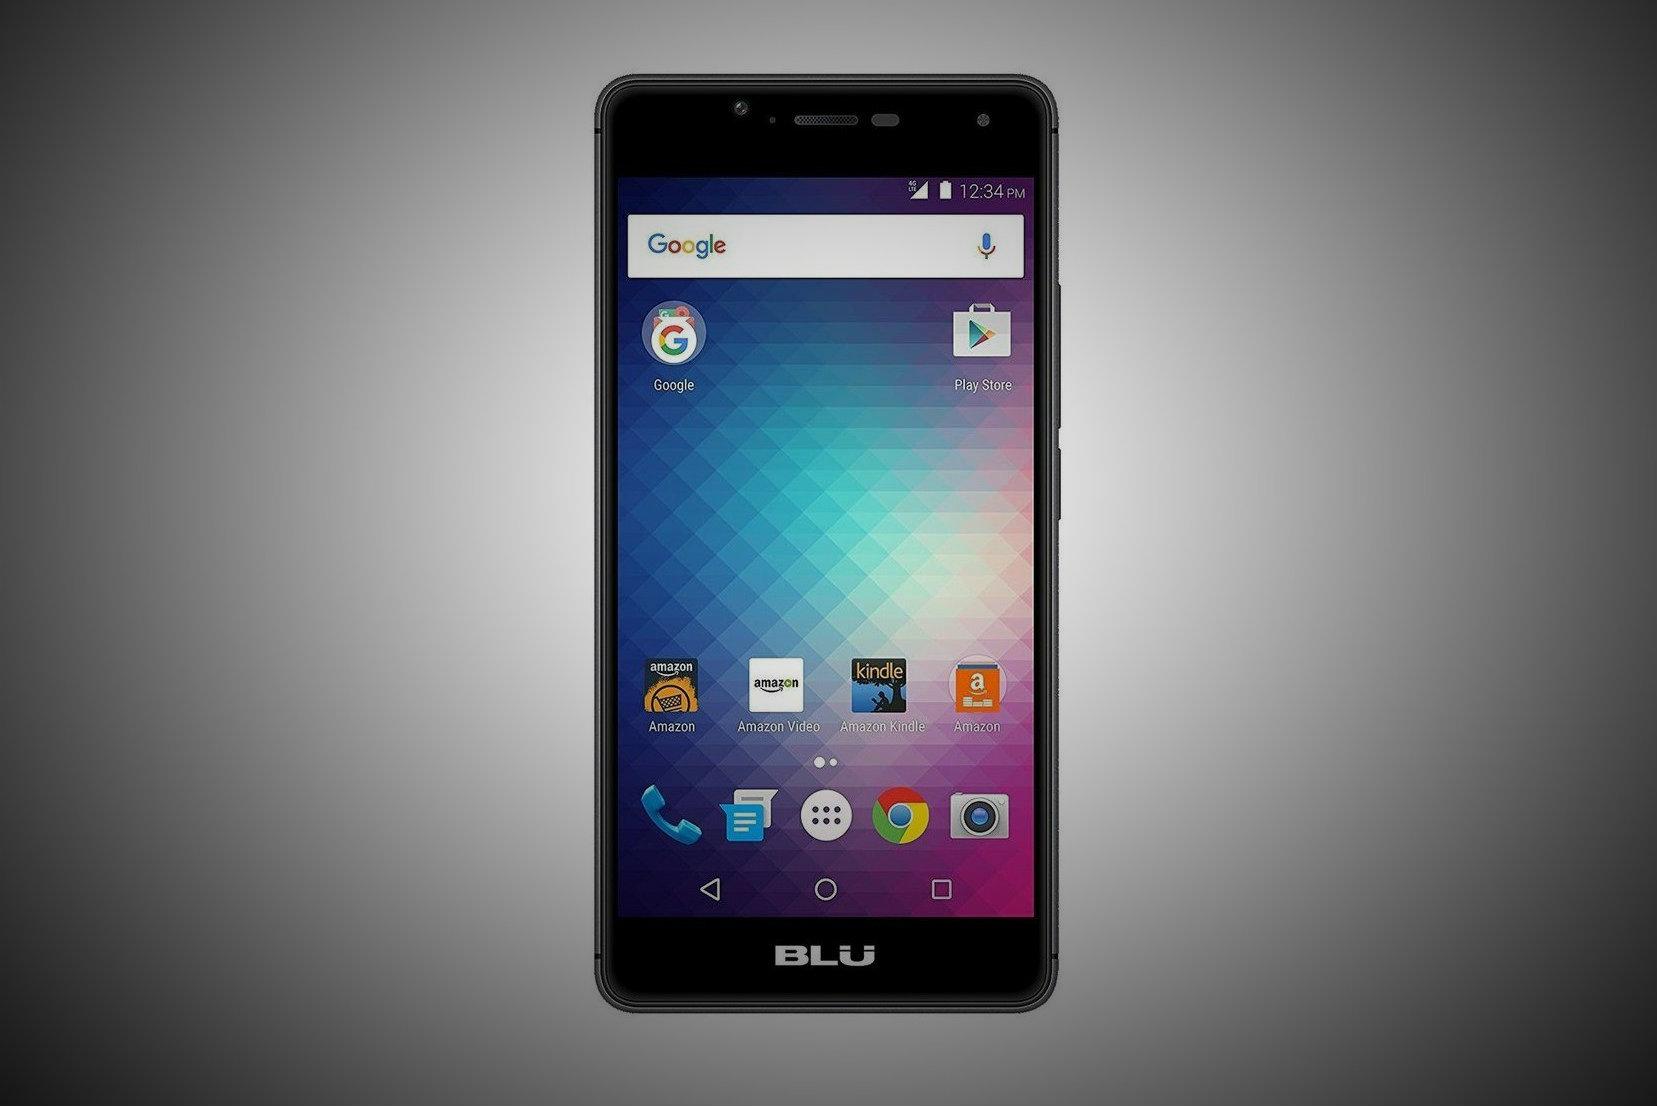 The Best 5 Prime Exclusive Mobile Phone Deals  Digital Trends